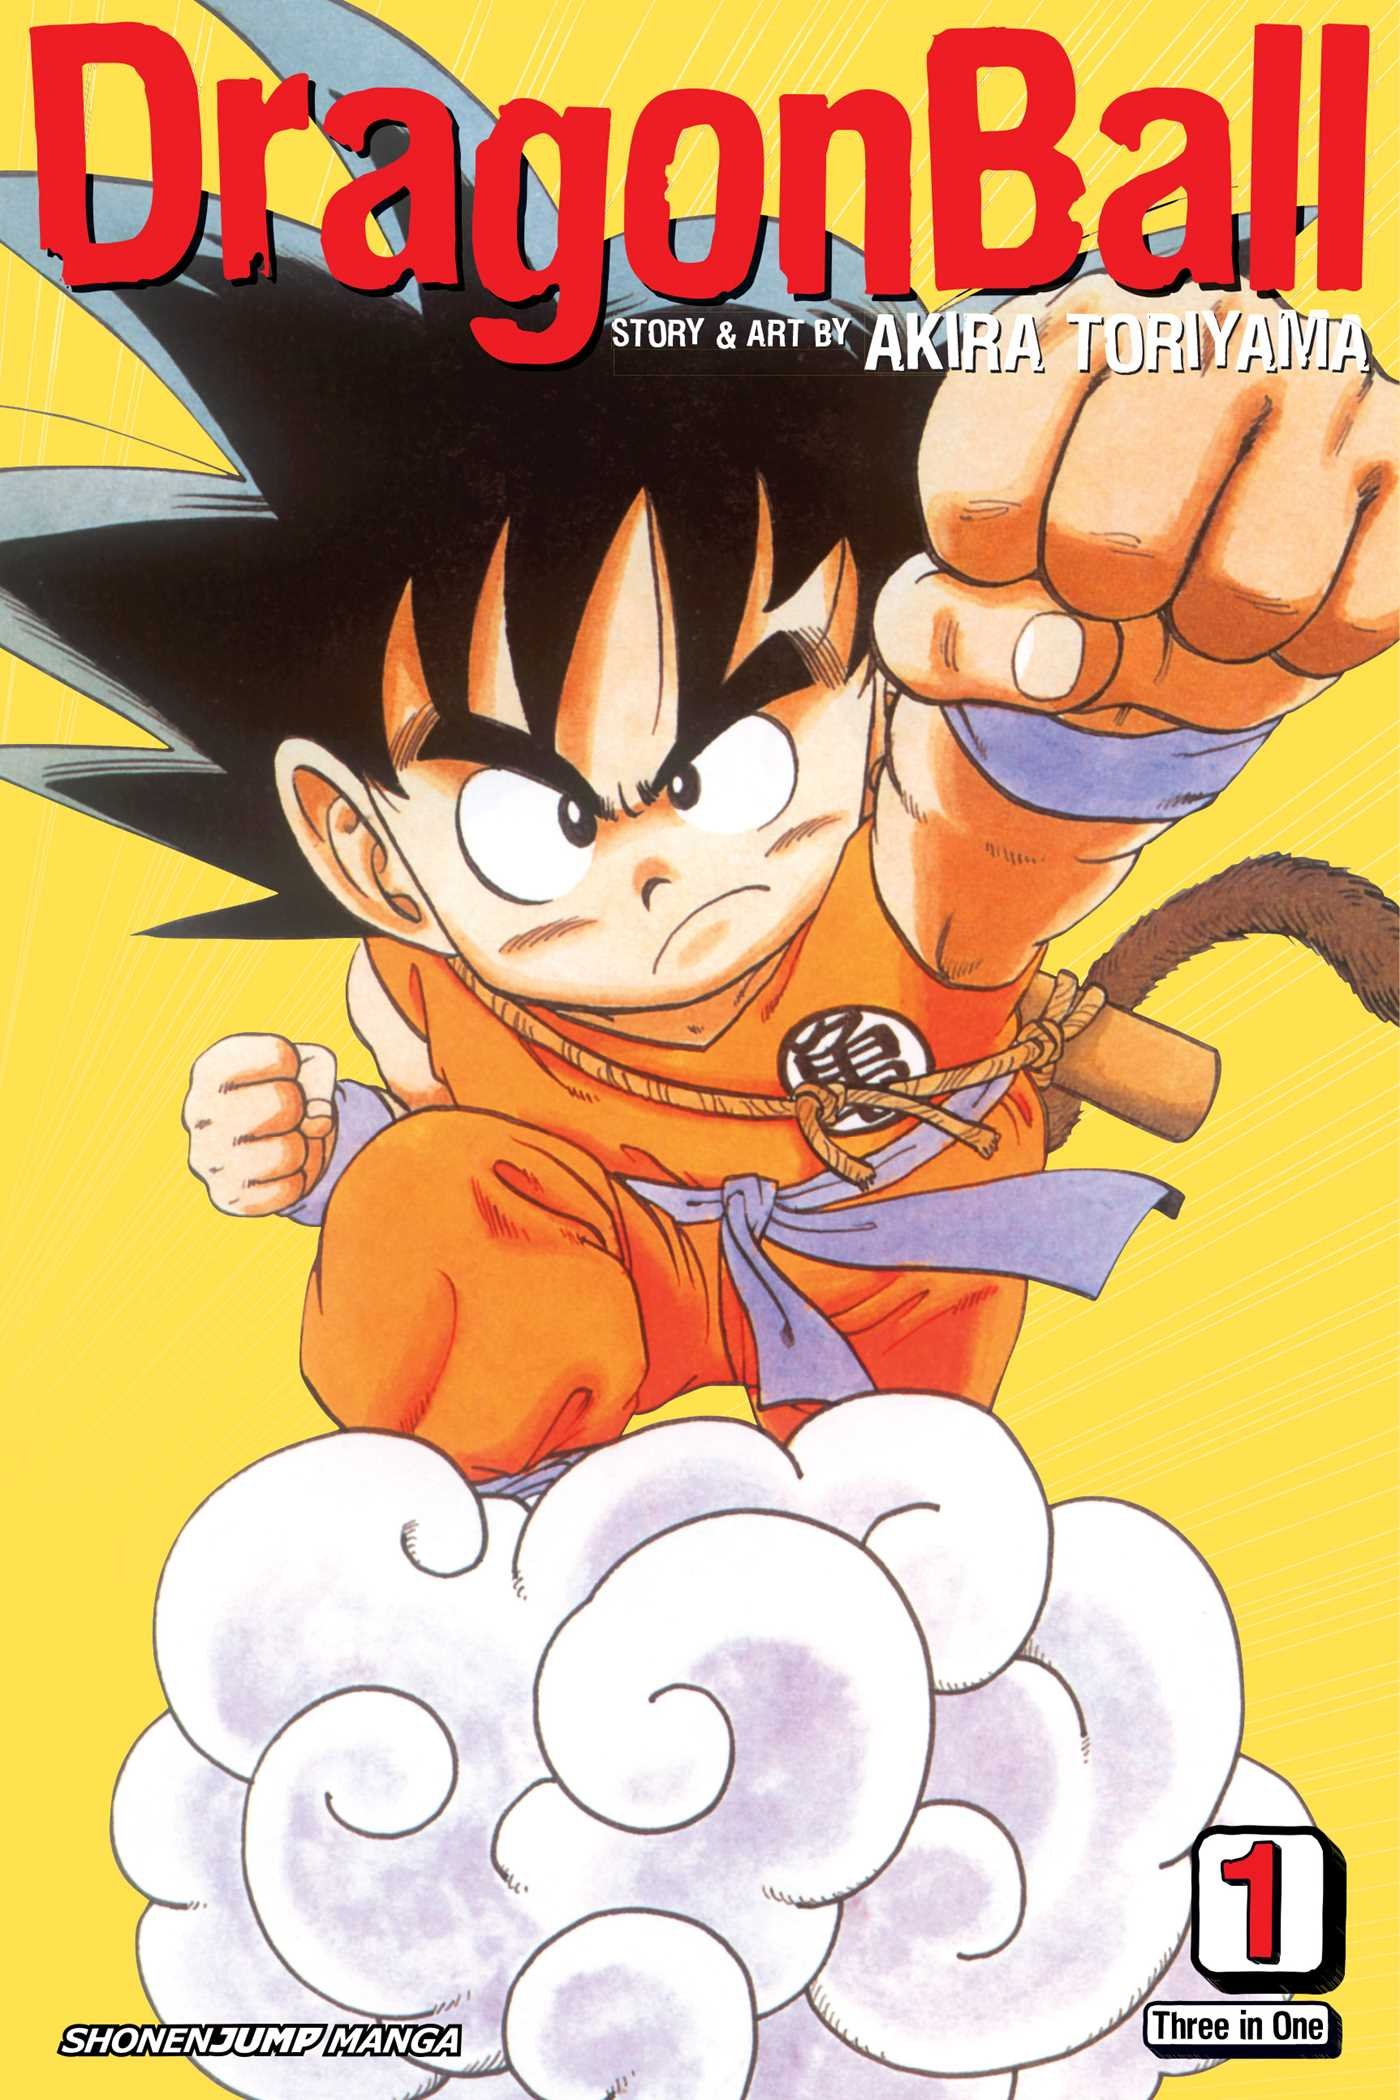 Dragon Ball (VIZBIG Edition), Vol. 1: The Quest for the Seven Dragon Balls (1)